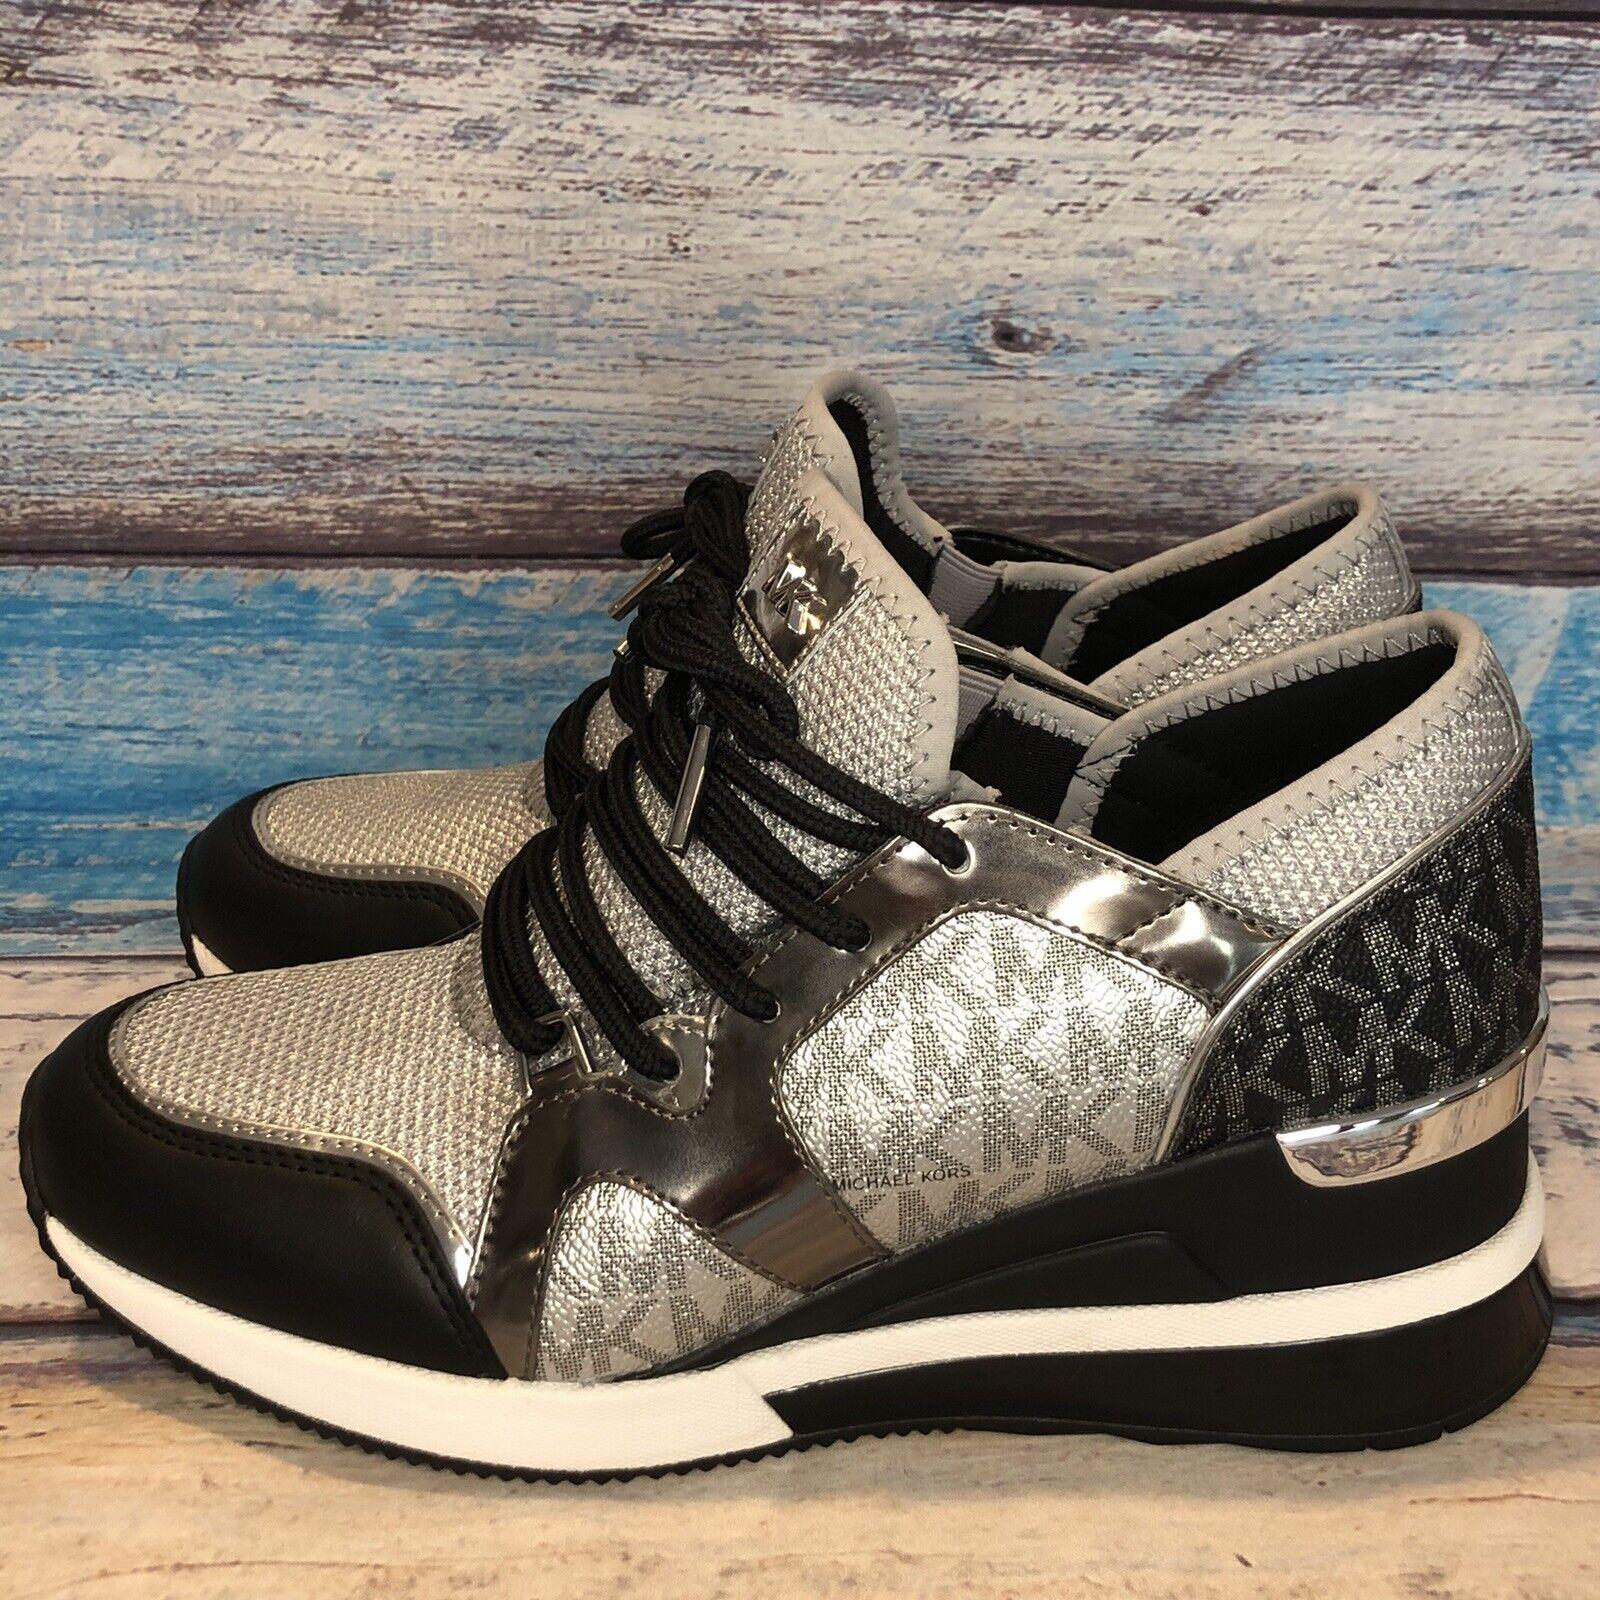 michael kors sneakers women's shoes